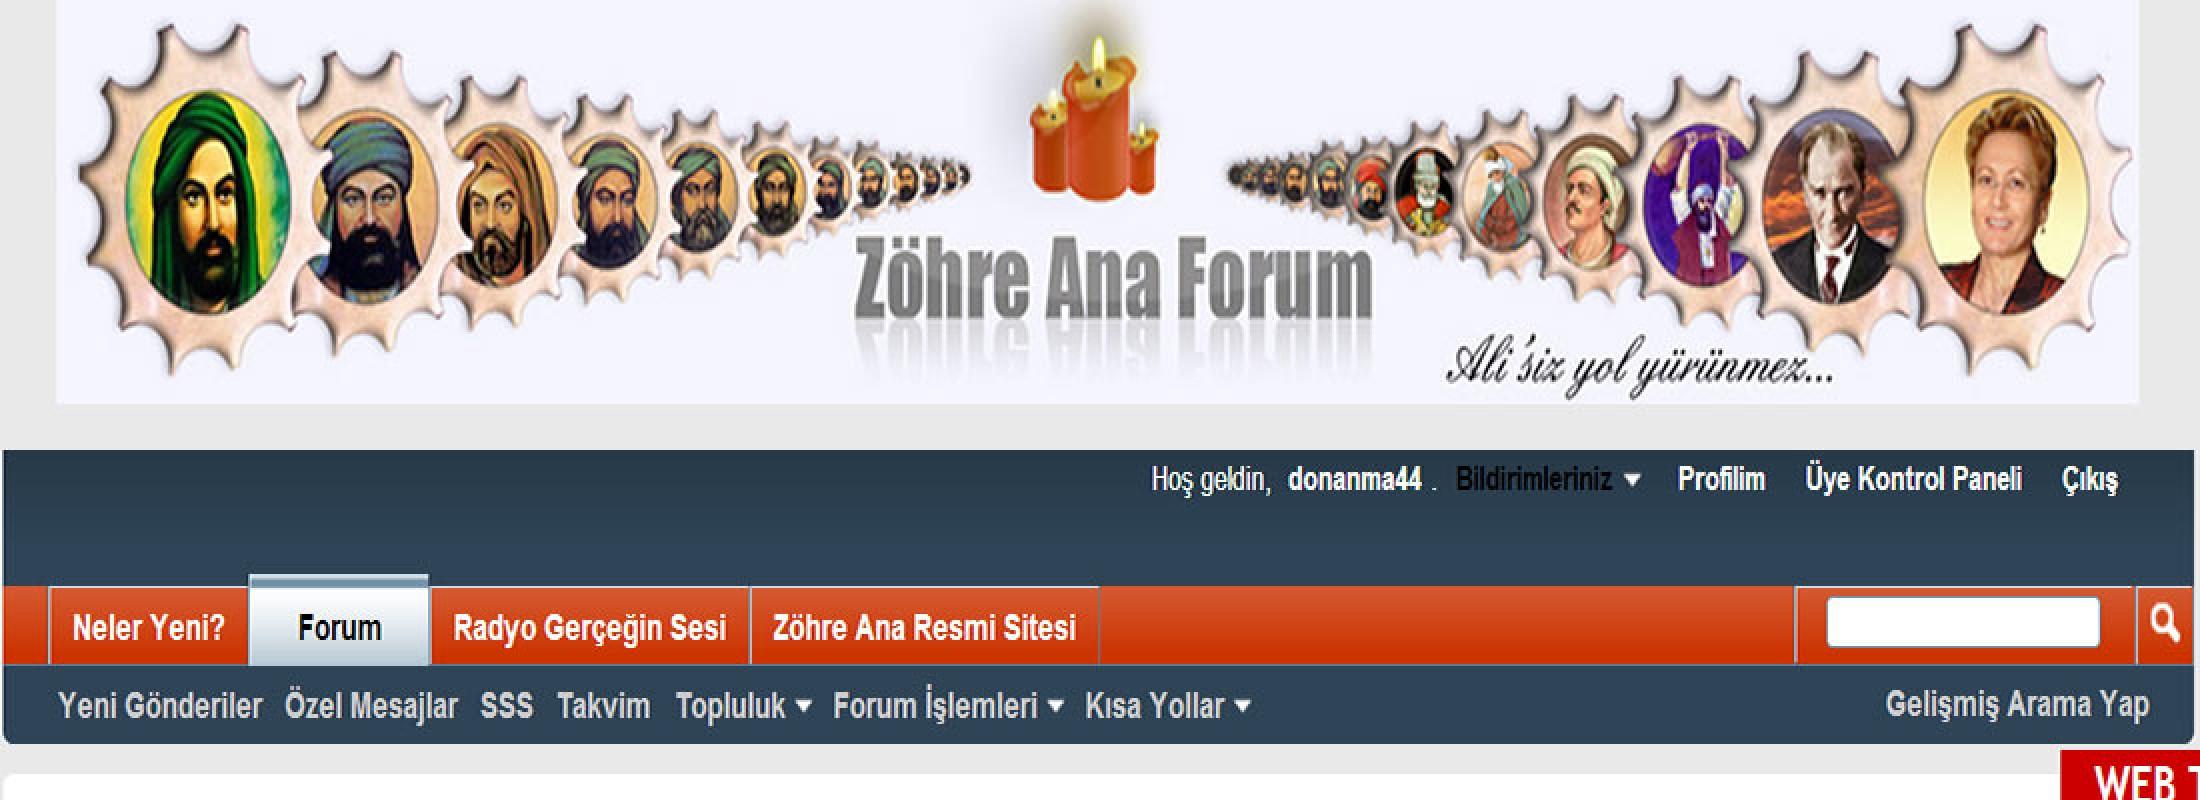 Zöhre Ana Forum